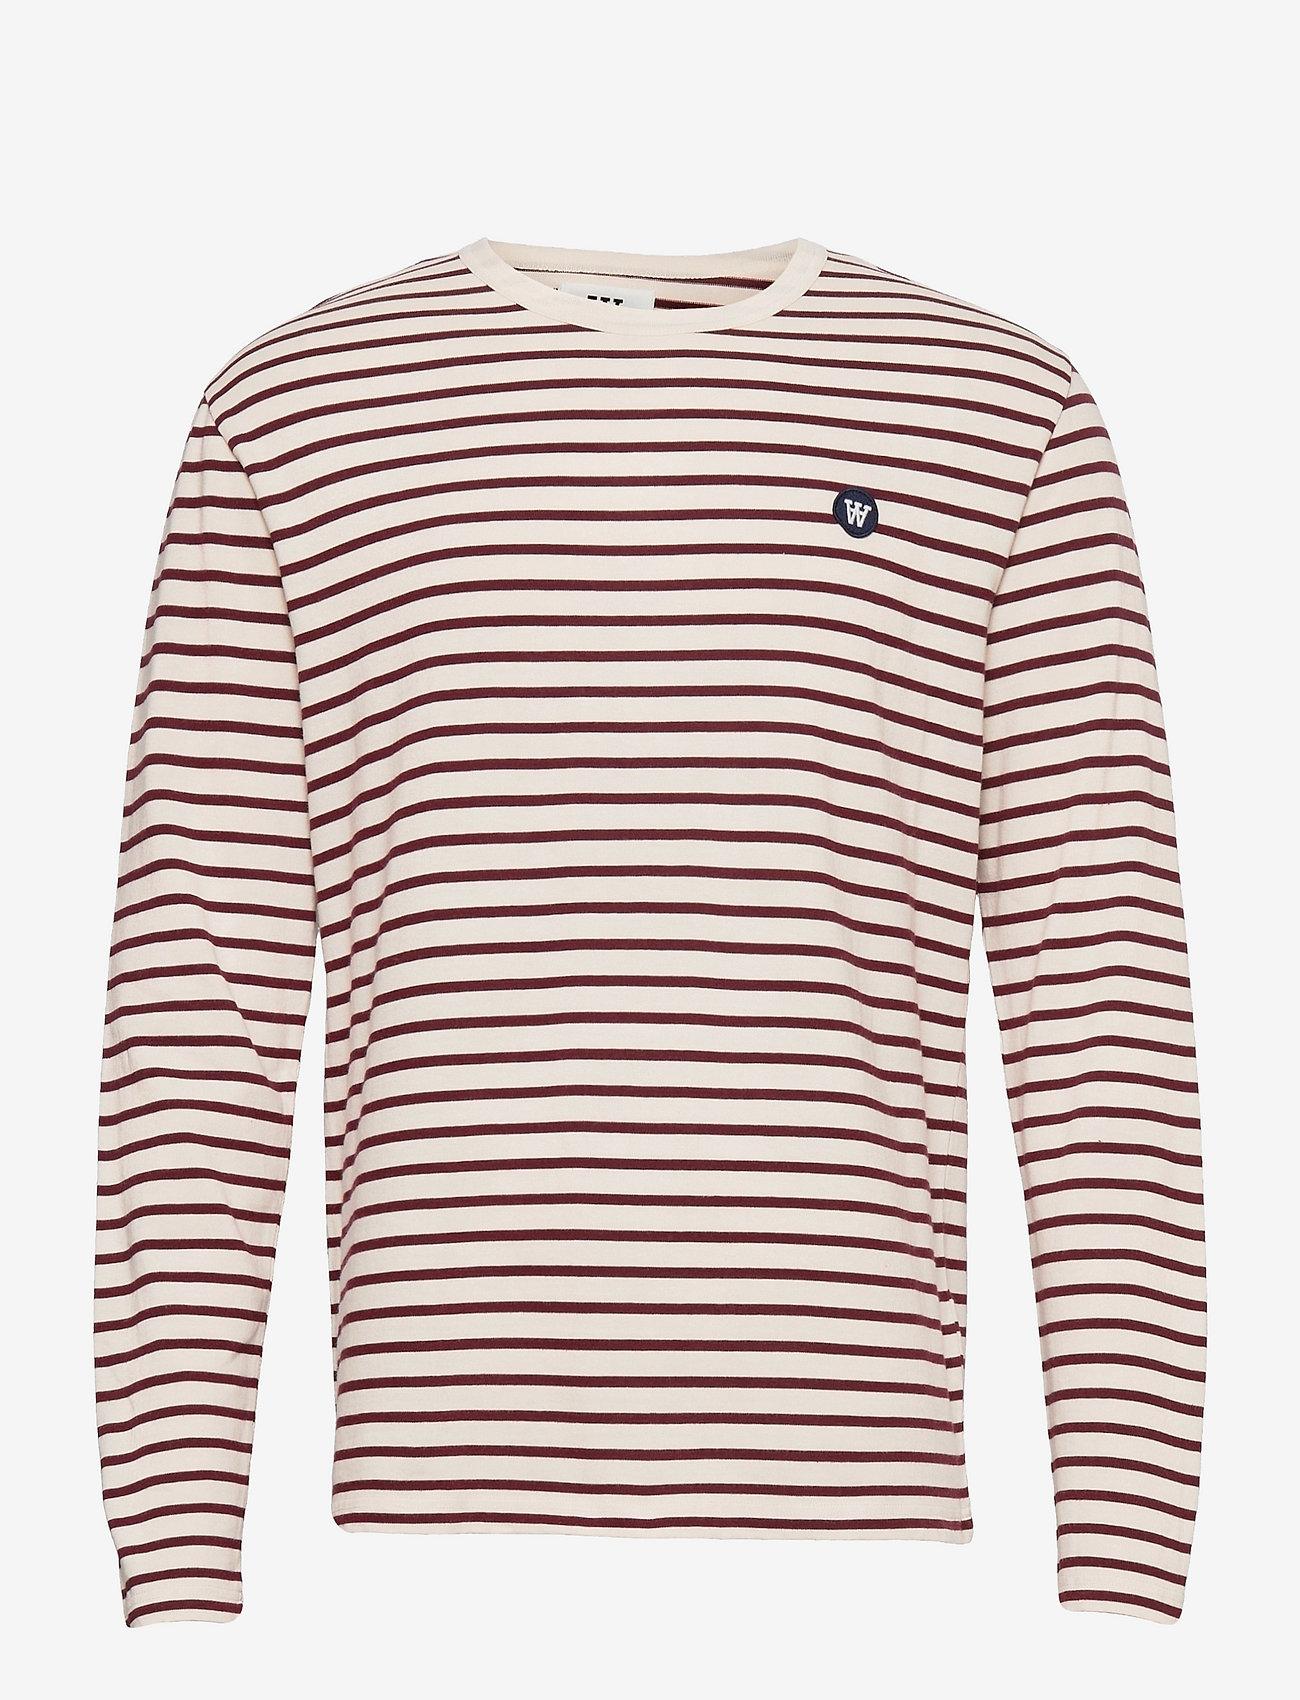 Wood Wood - Mel long sleeve - lange mouwen - off-white/dark red stripes - 0